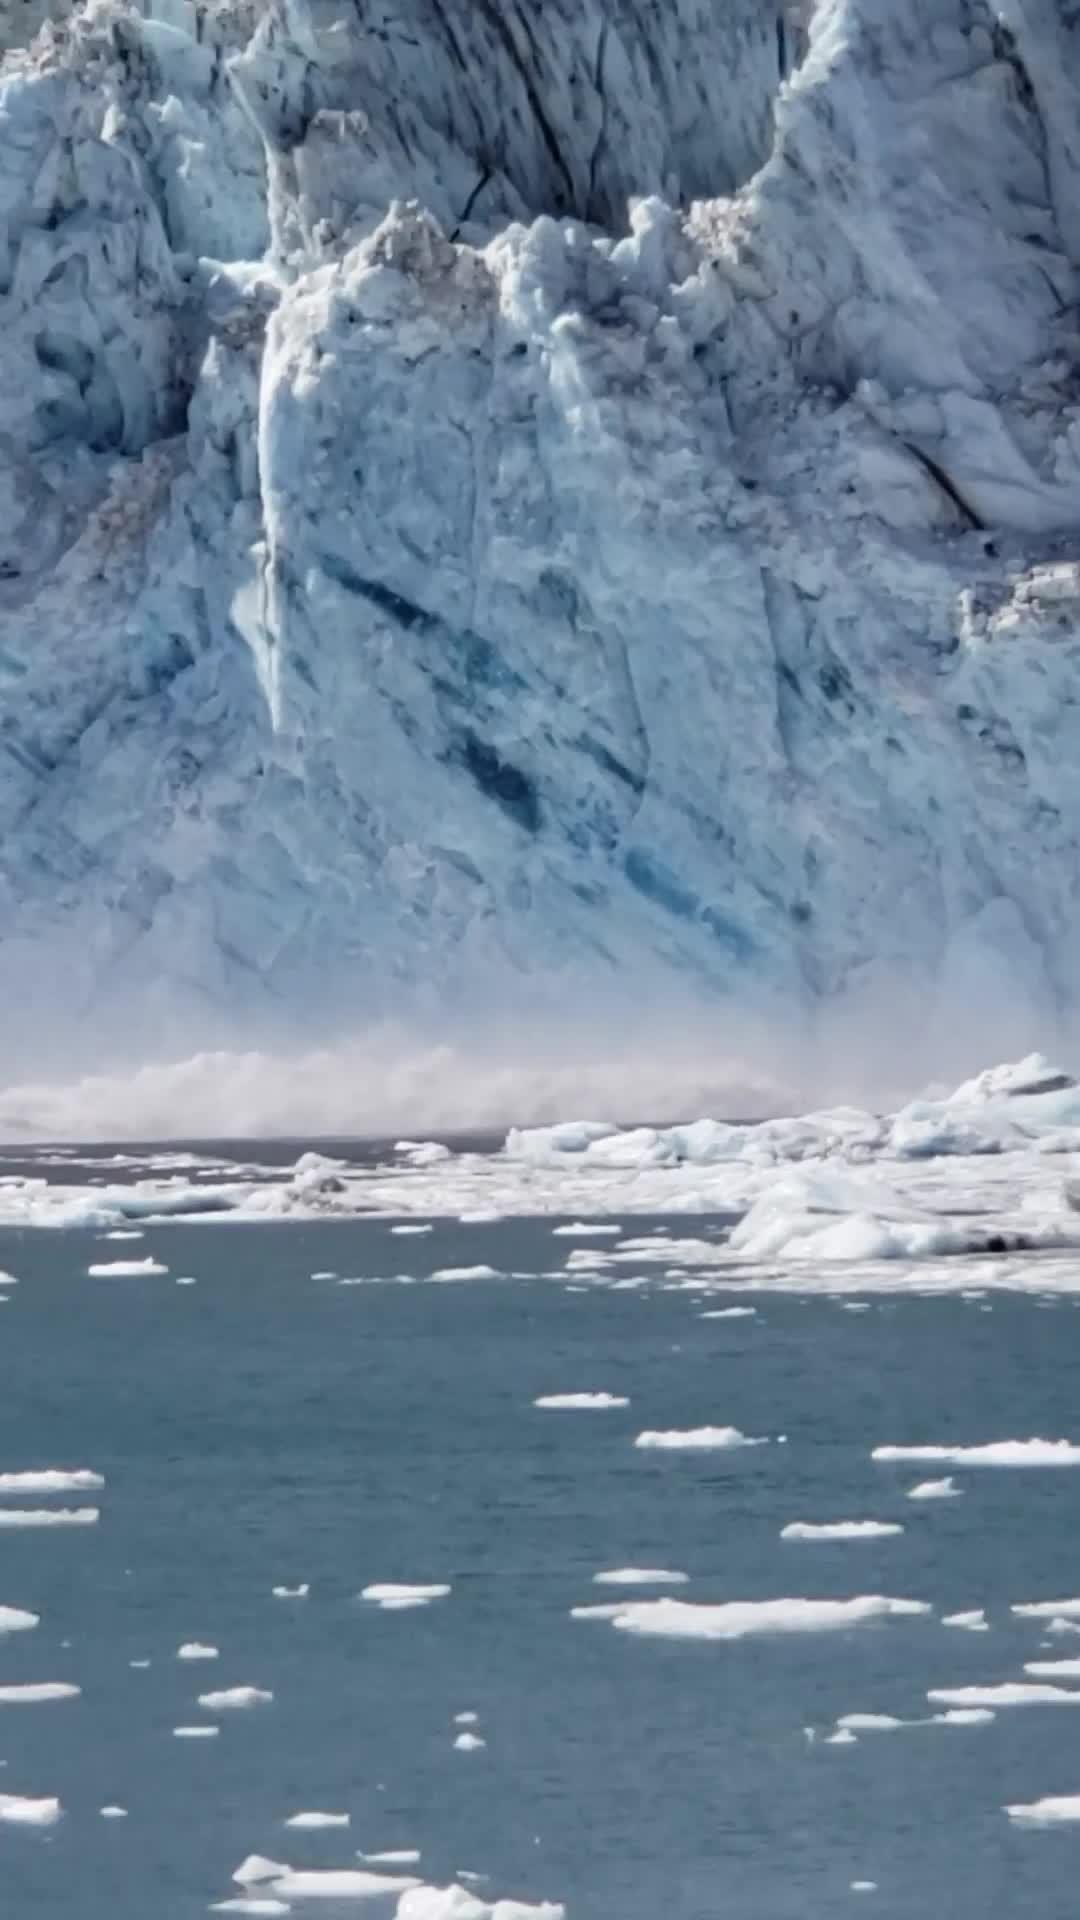 Video - Glacier Comes Crashing Down - Viral Viral Videos